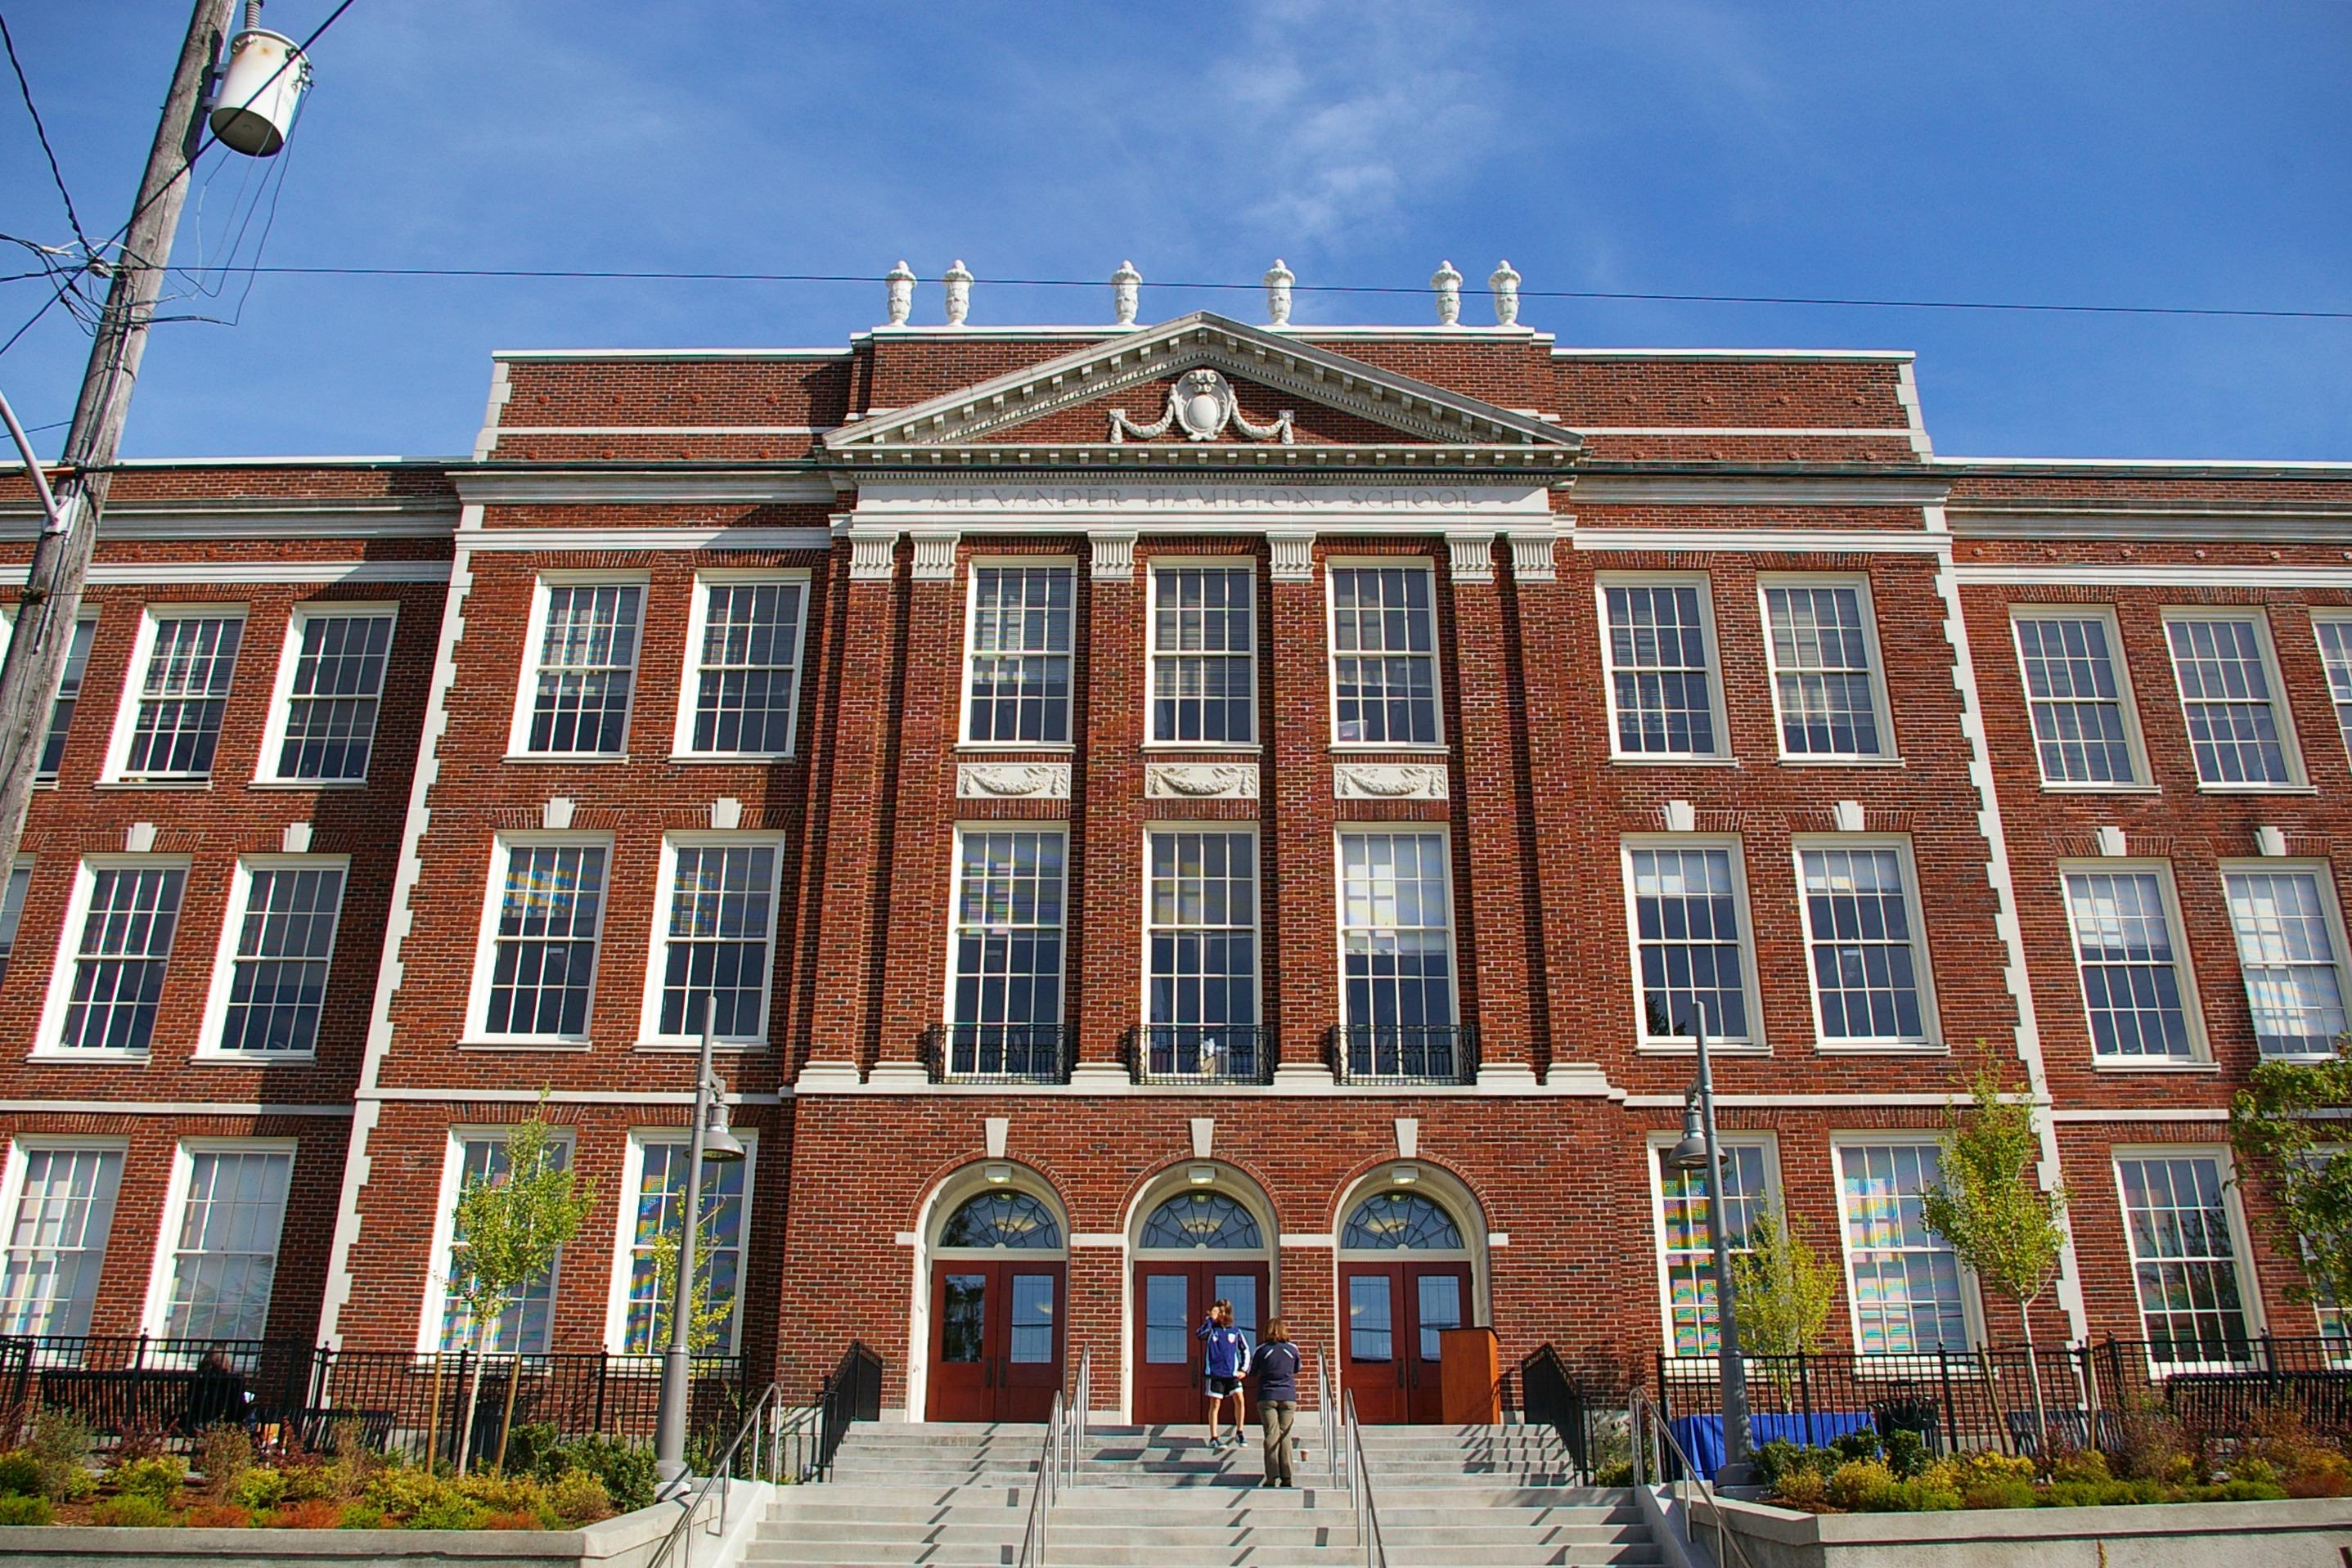 Hamilton Middle School